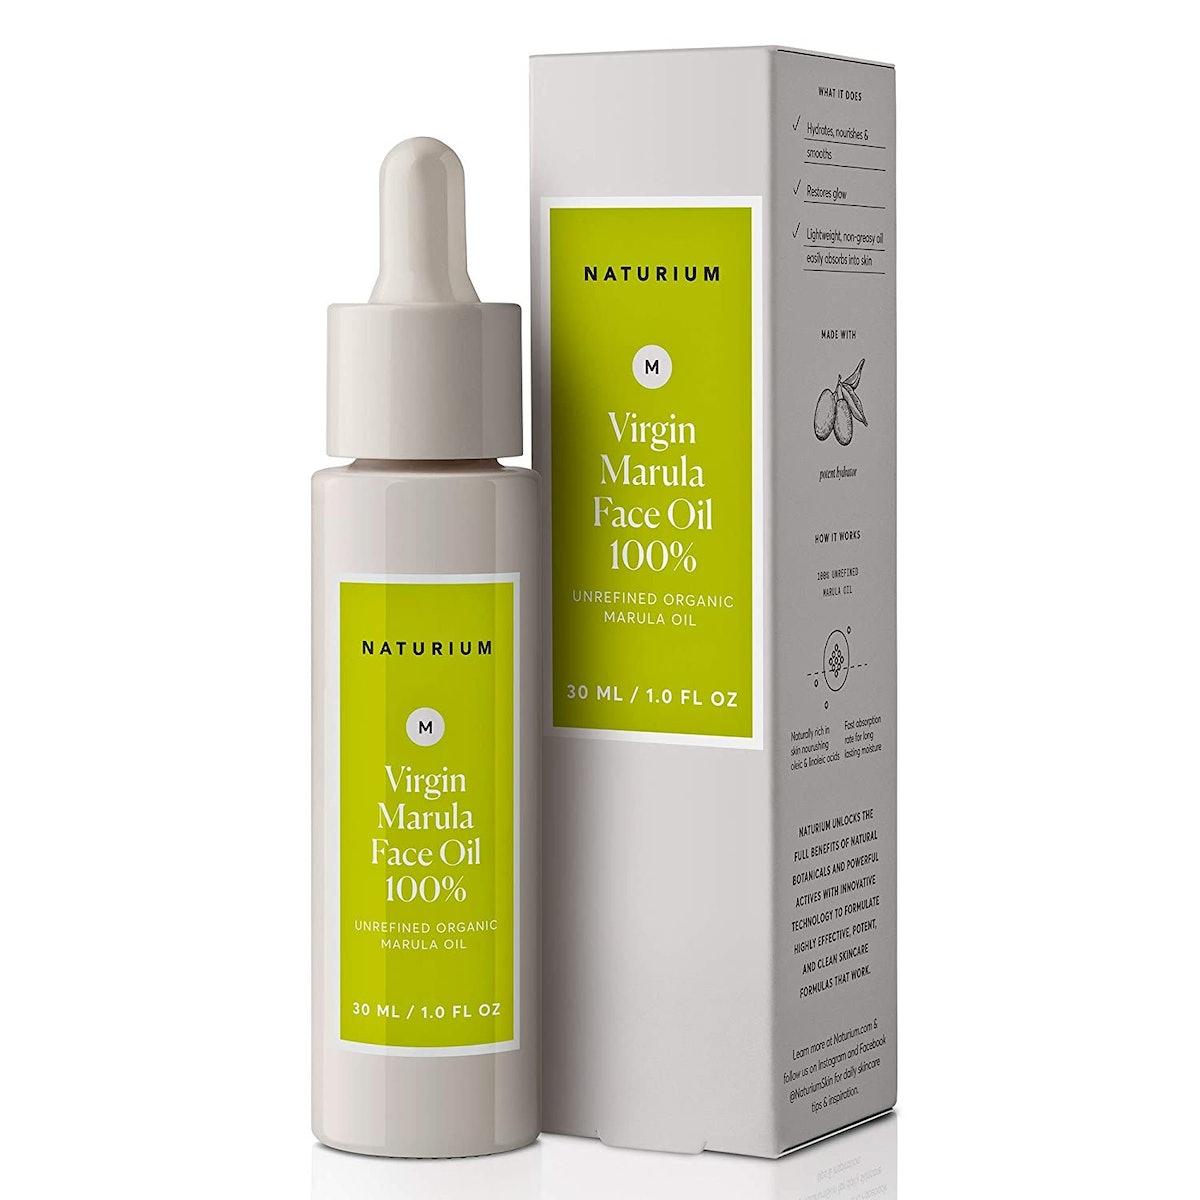 Naturium Virgin Marula Face Oil